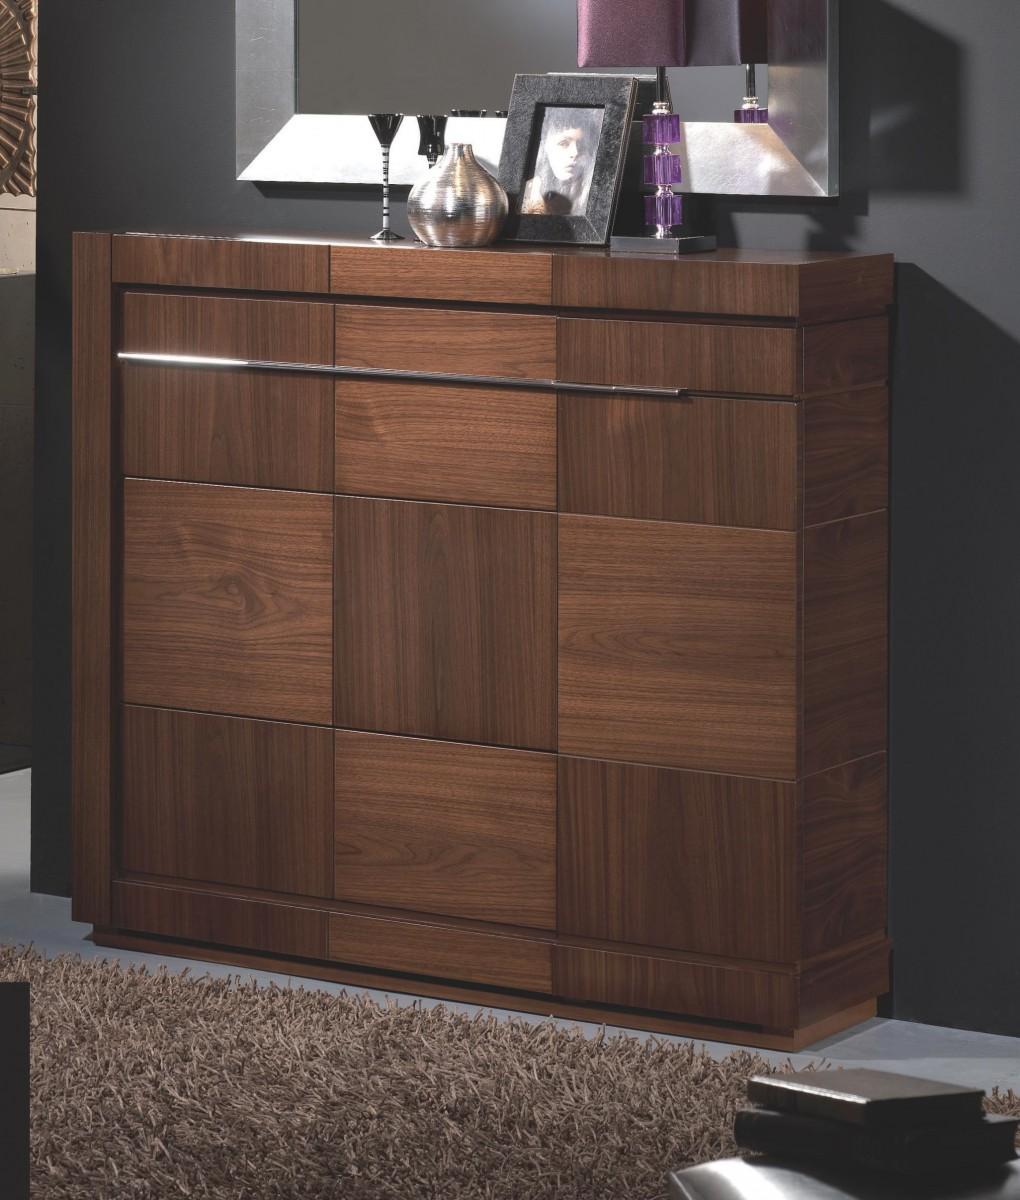 Mueble recibidor zapatero clasico moderno lacado muebles for Mueble zapatero bajo